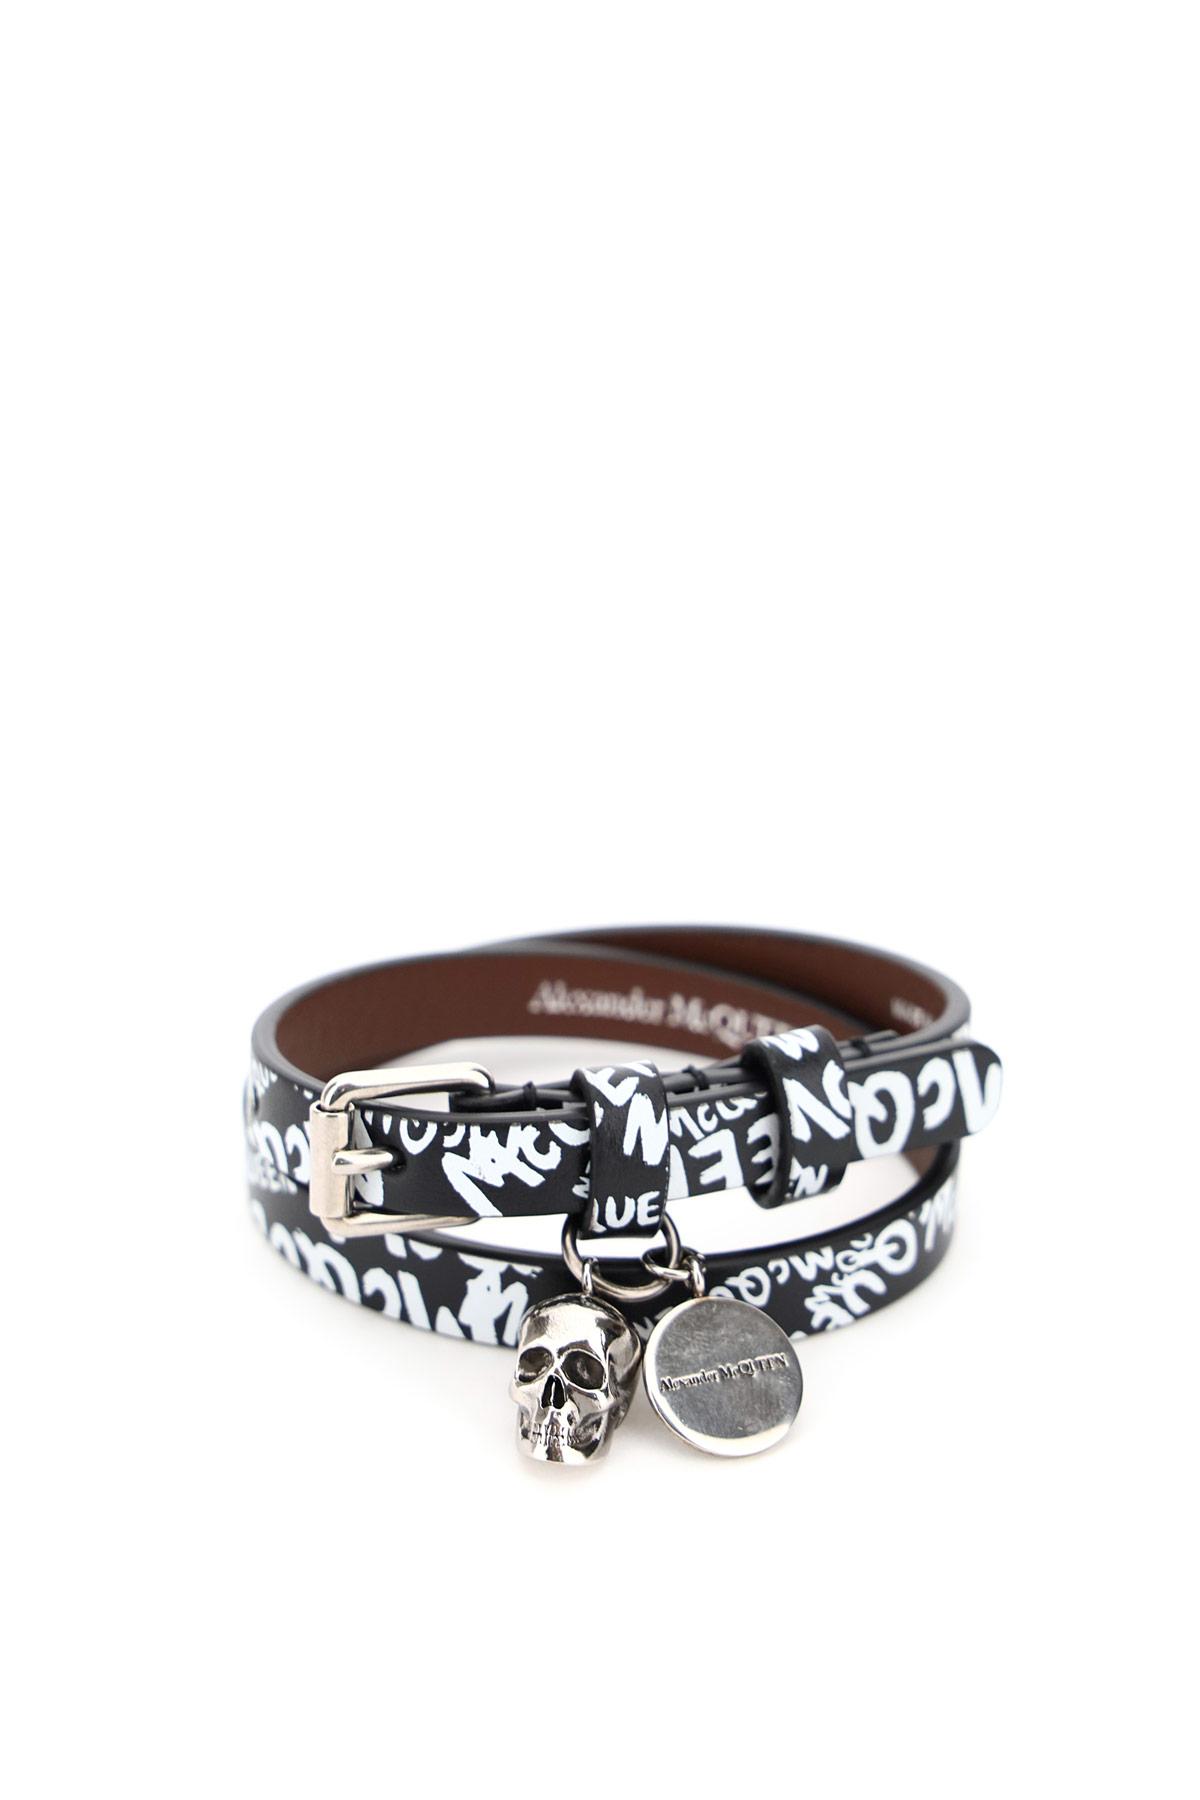 ALEXANDER MCQUEEN PIONIER DOUBLE WRAP BRACELET WITH LOGO OS Black, White Leather